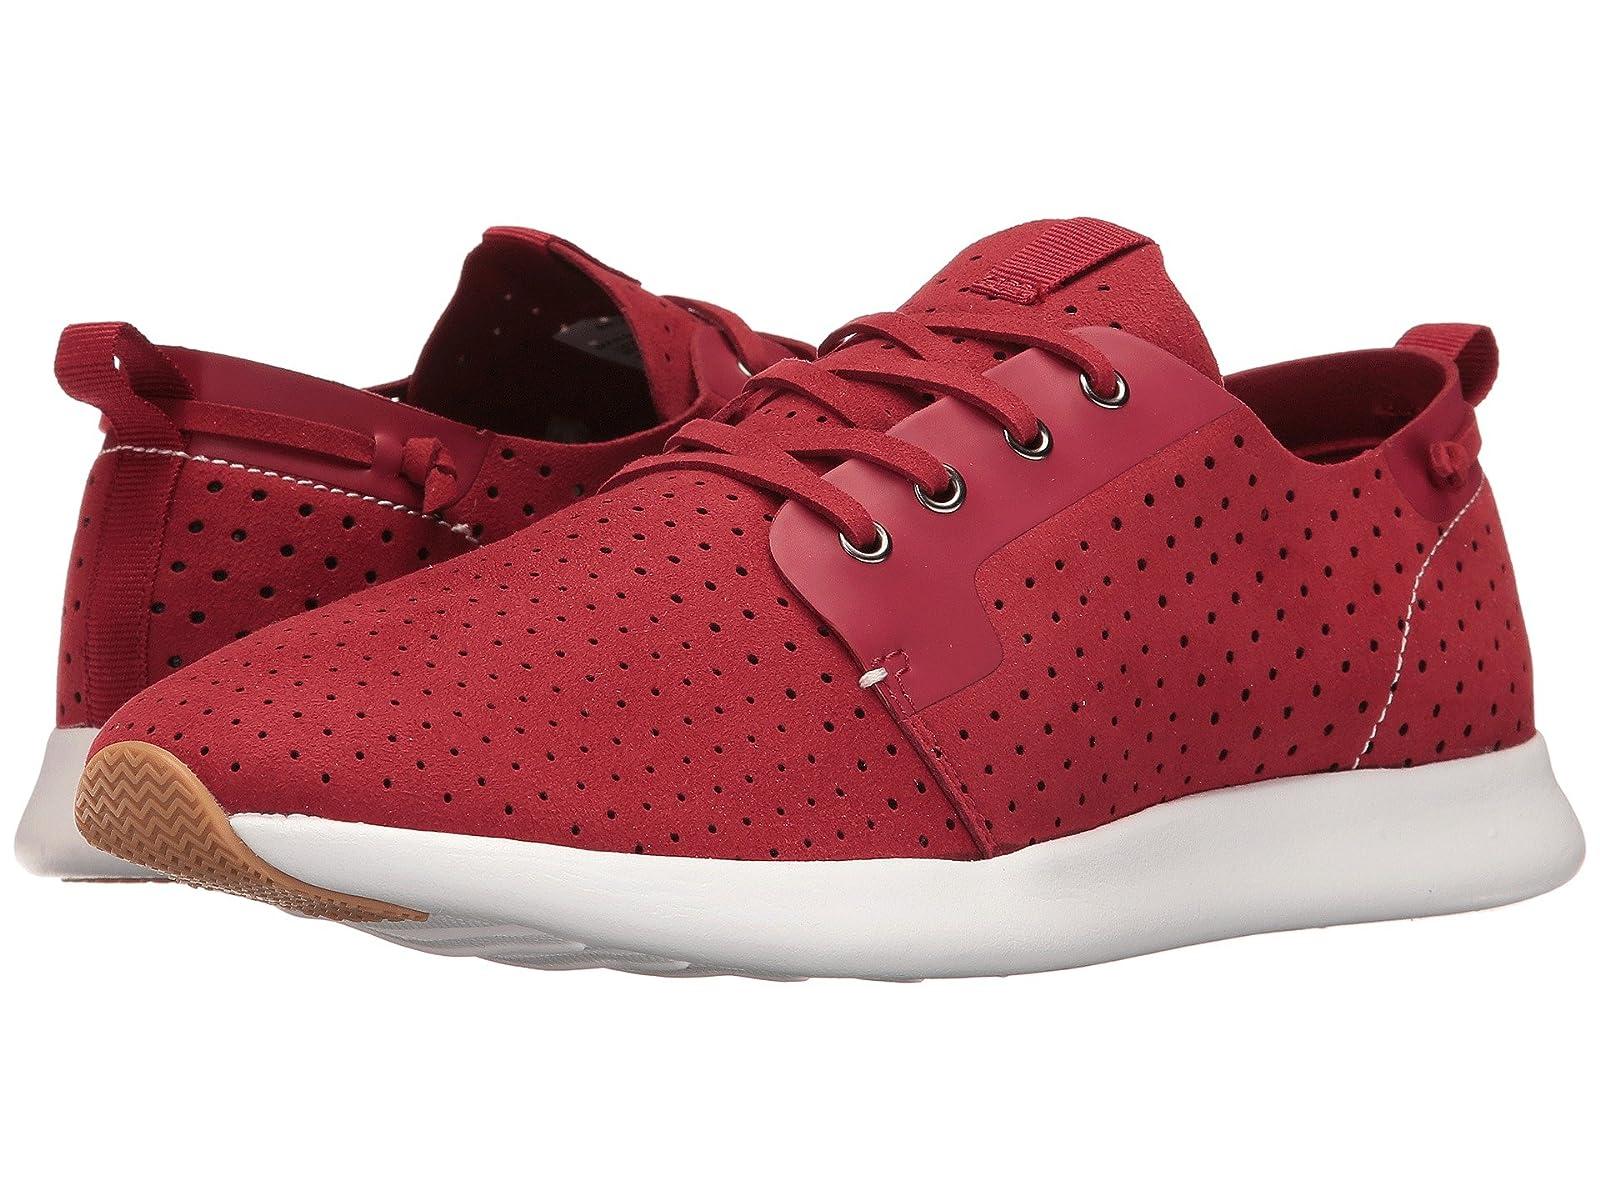 Steve Madden BrixxonCheap and distinctive eye-catching shoes